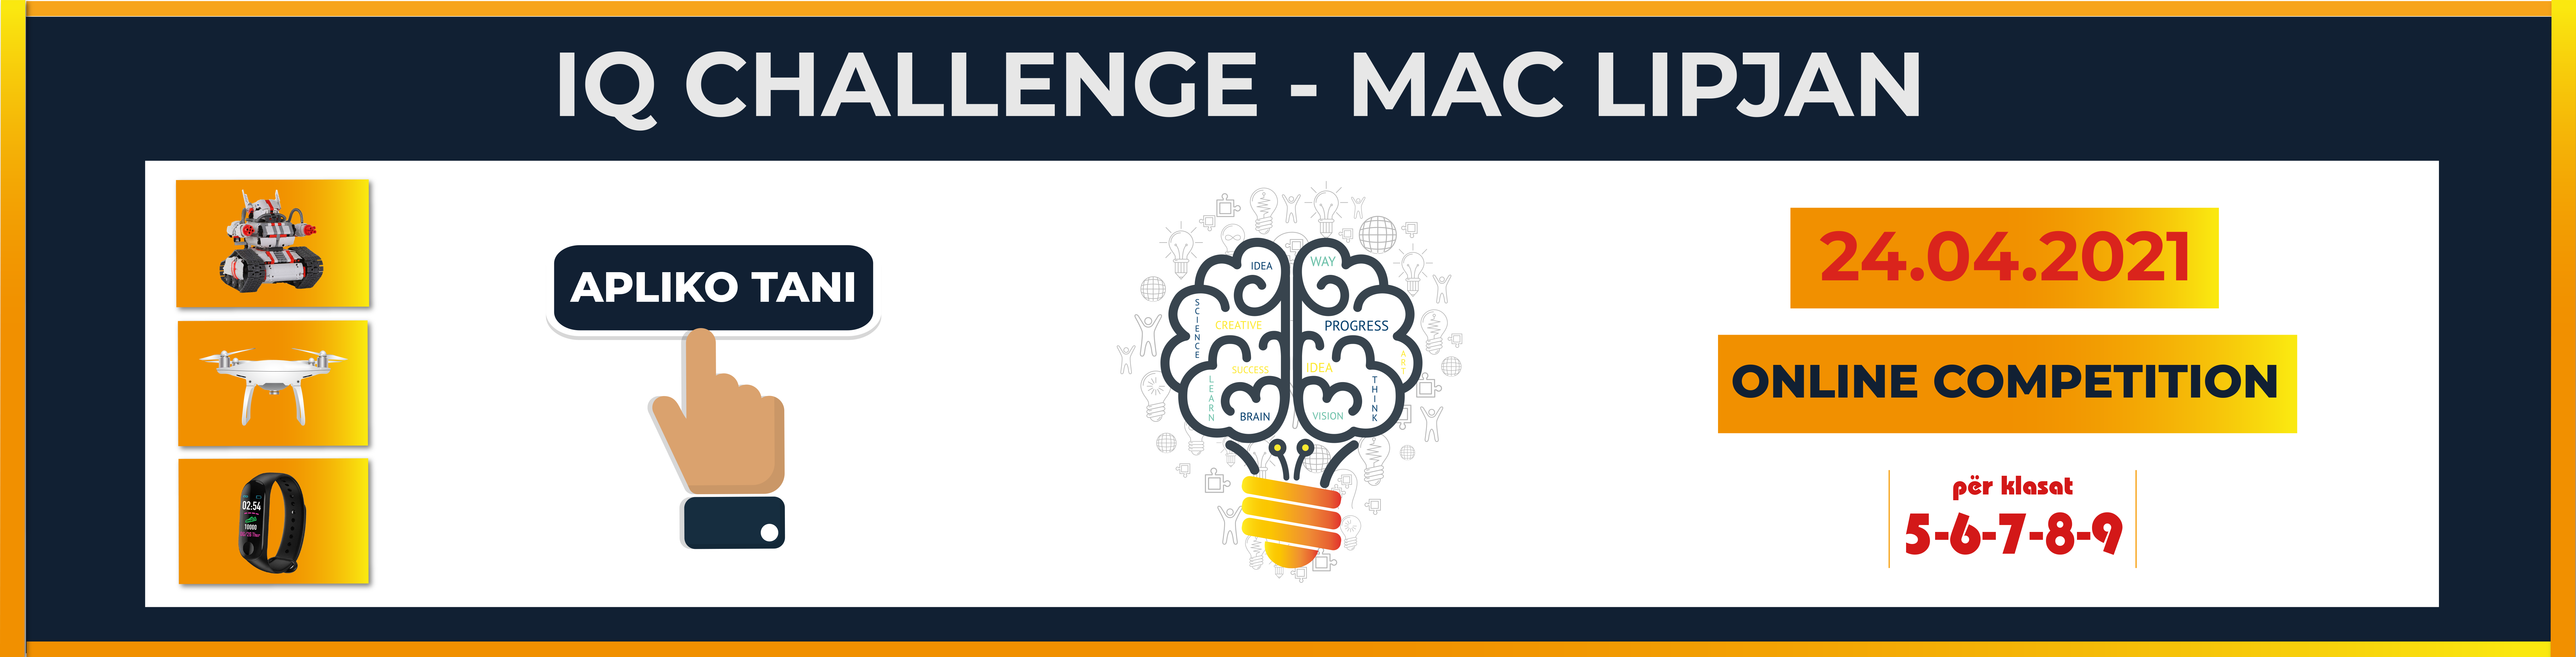 Apply for IQ CHALLENGE – MAC LIPJAN